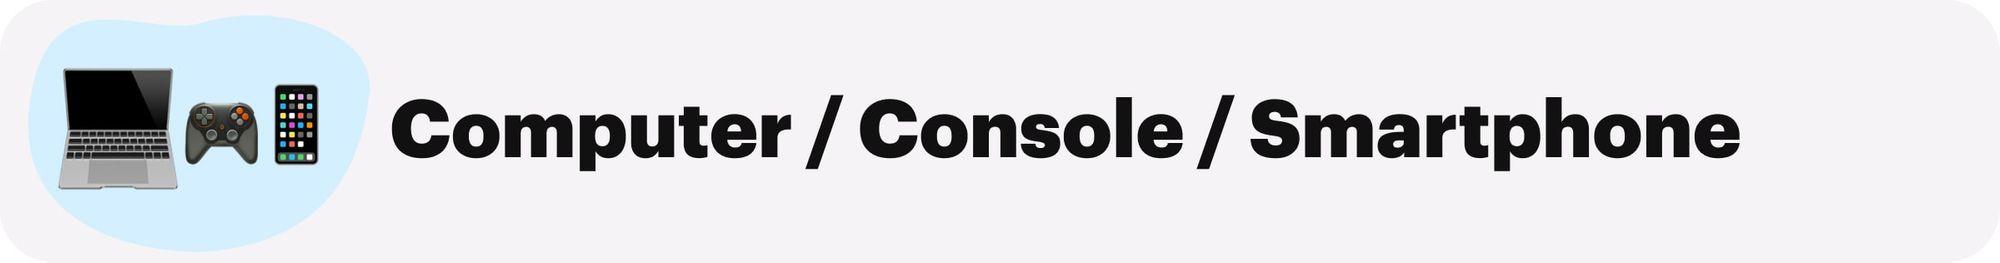 Computer / Console / Smartphone